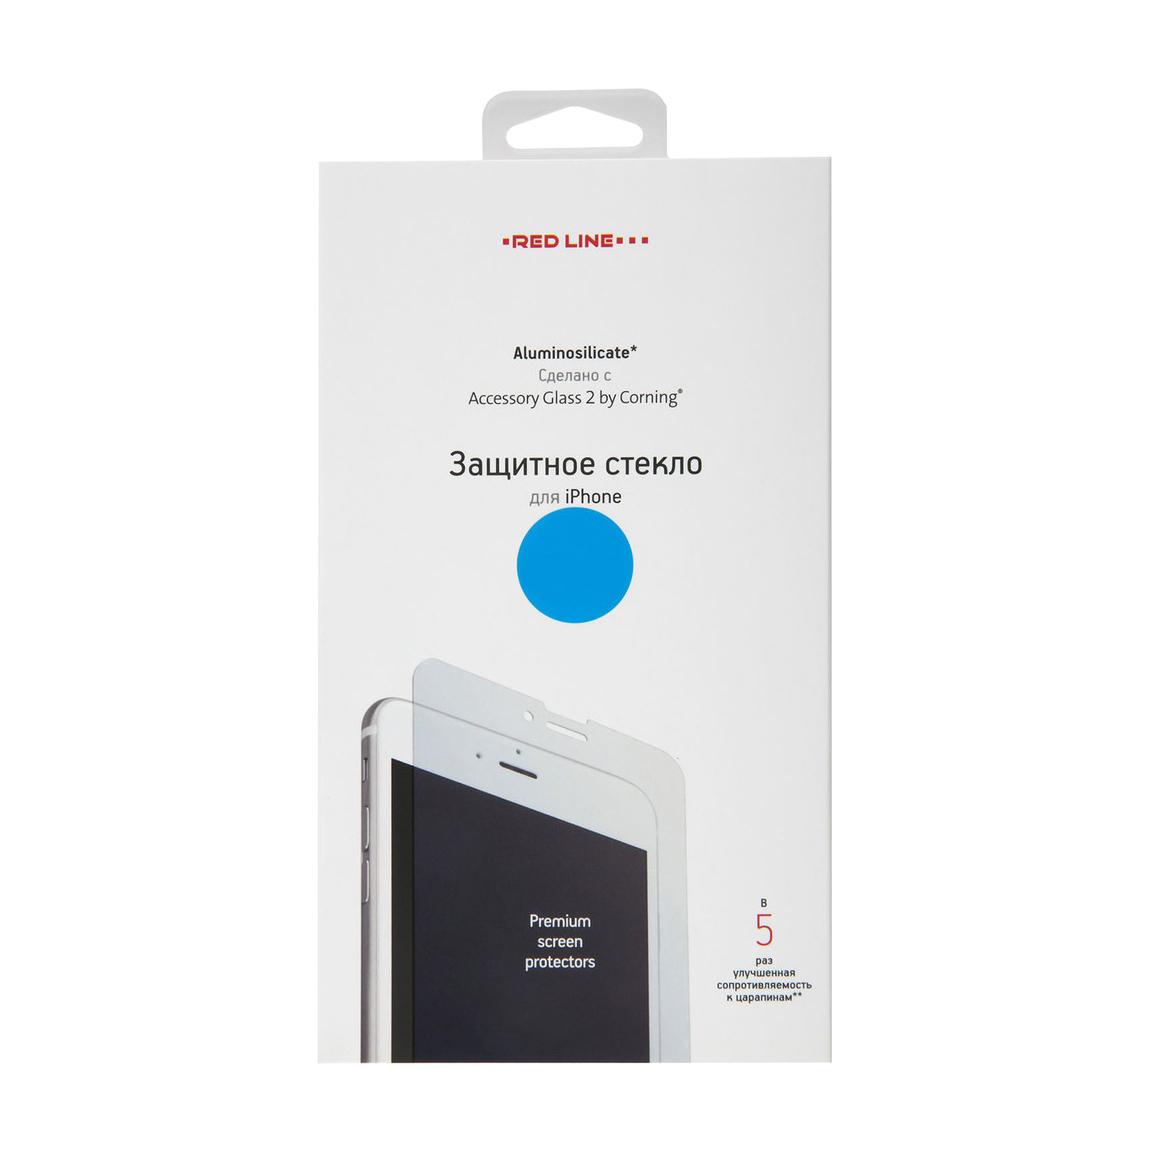 Фото - Защитное стекло Red Line Corning tempered glass для Apple iPhone 11 Pro защитное стекло red line corning full screen для apple iphone 12 pro черный